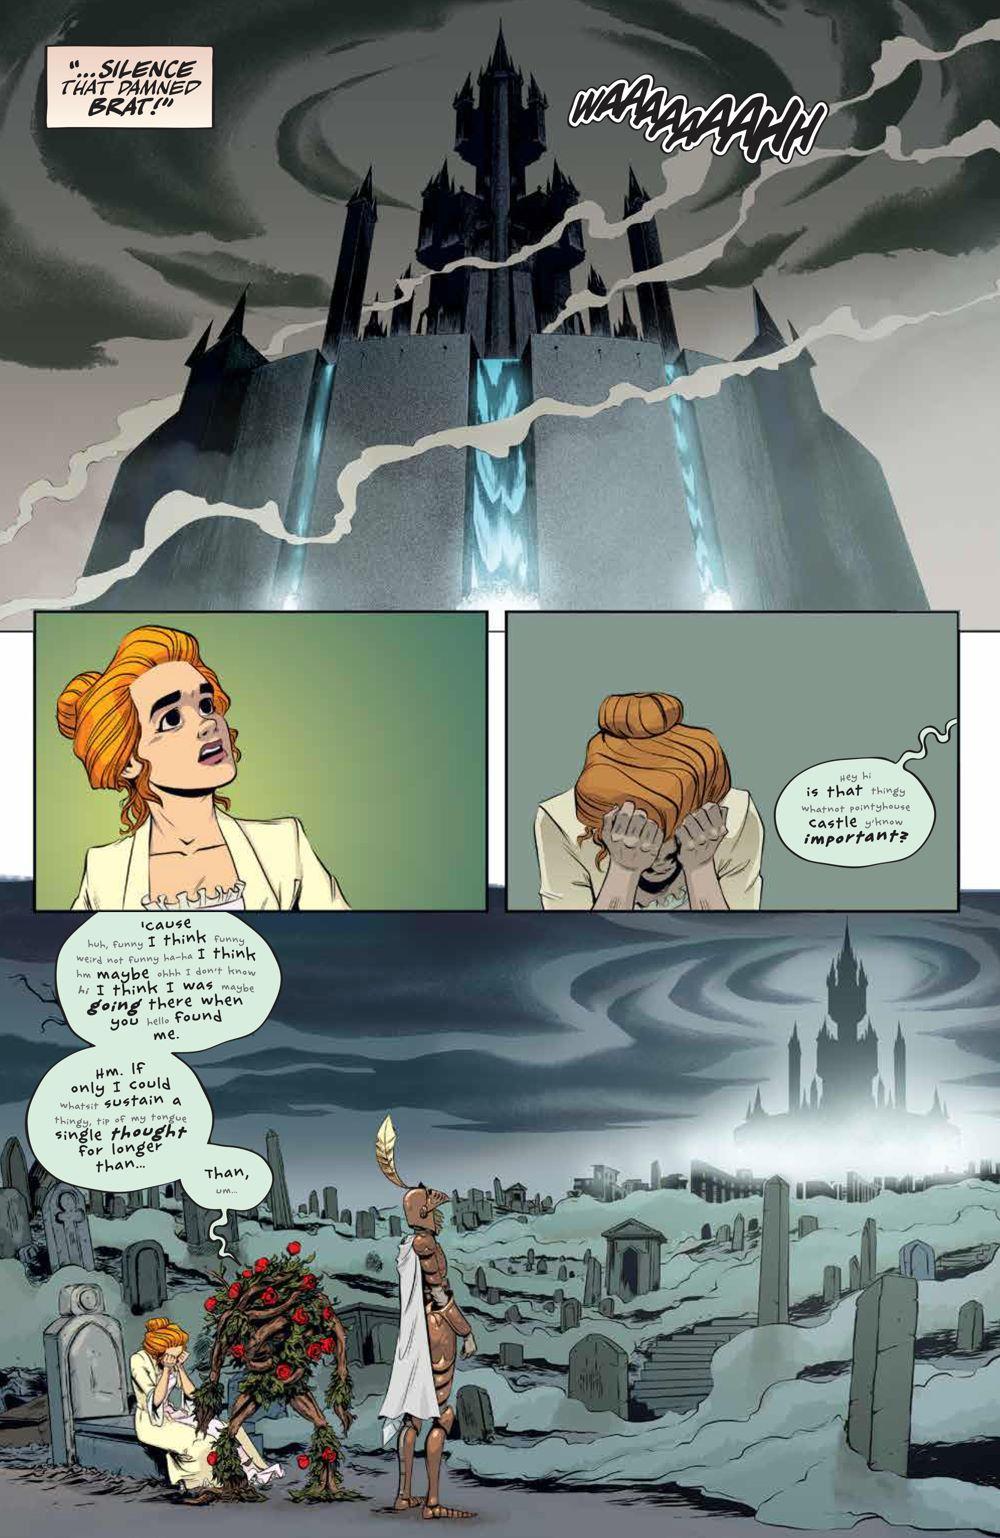 LabyrinthCoronation_v2_SC_PRESS_14 ComicList Previews: JIM HENSON'S LABYRINTH CORONATION VOLUME 2 TP